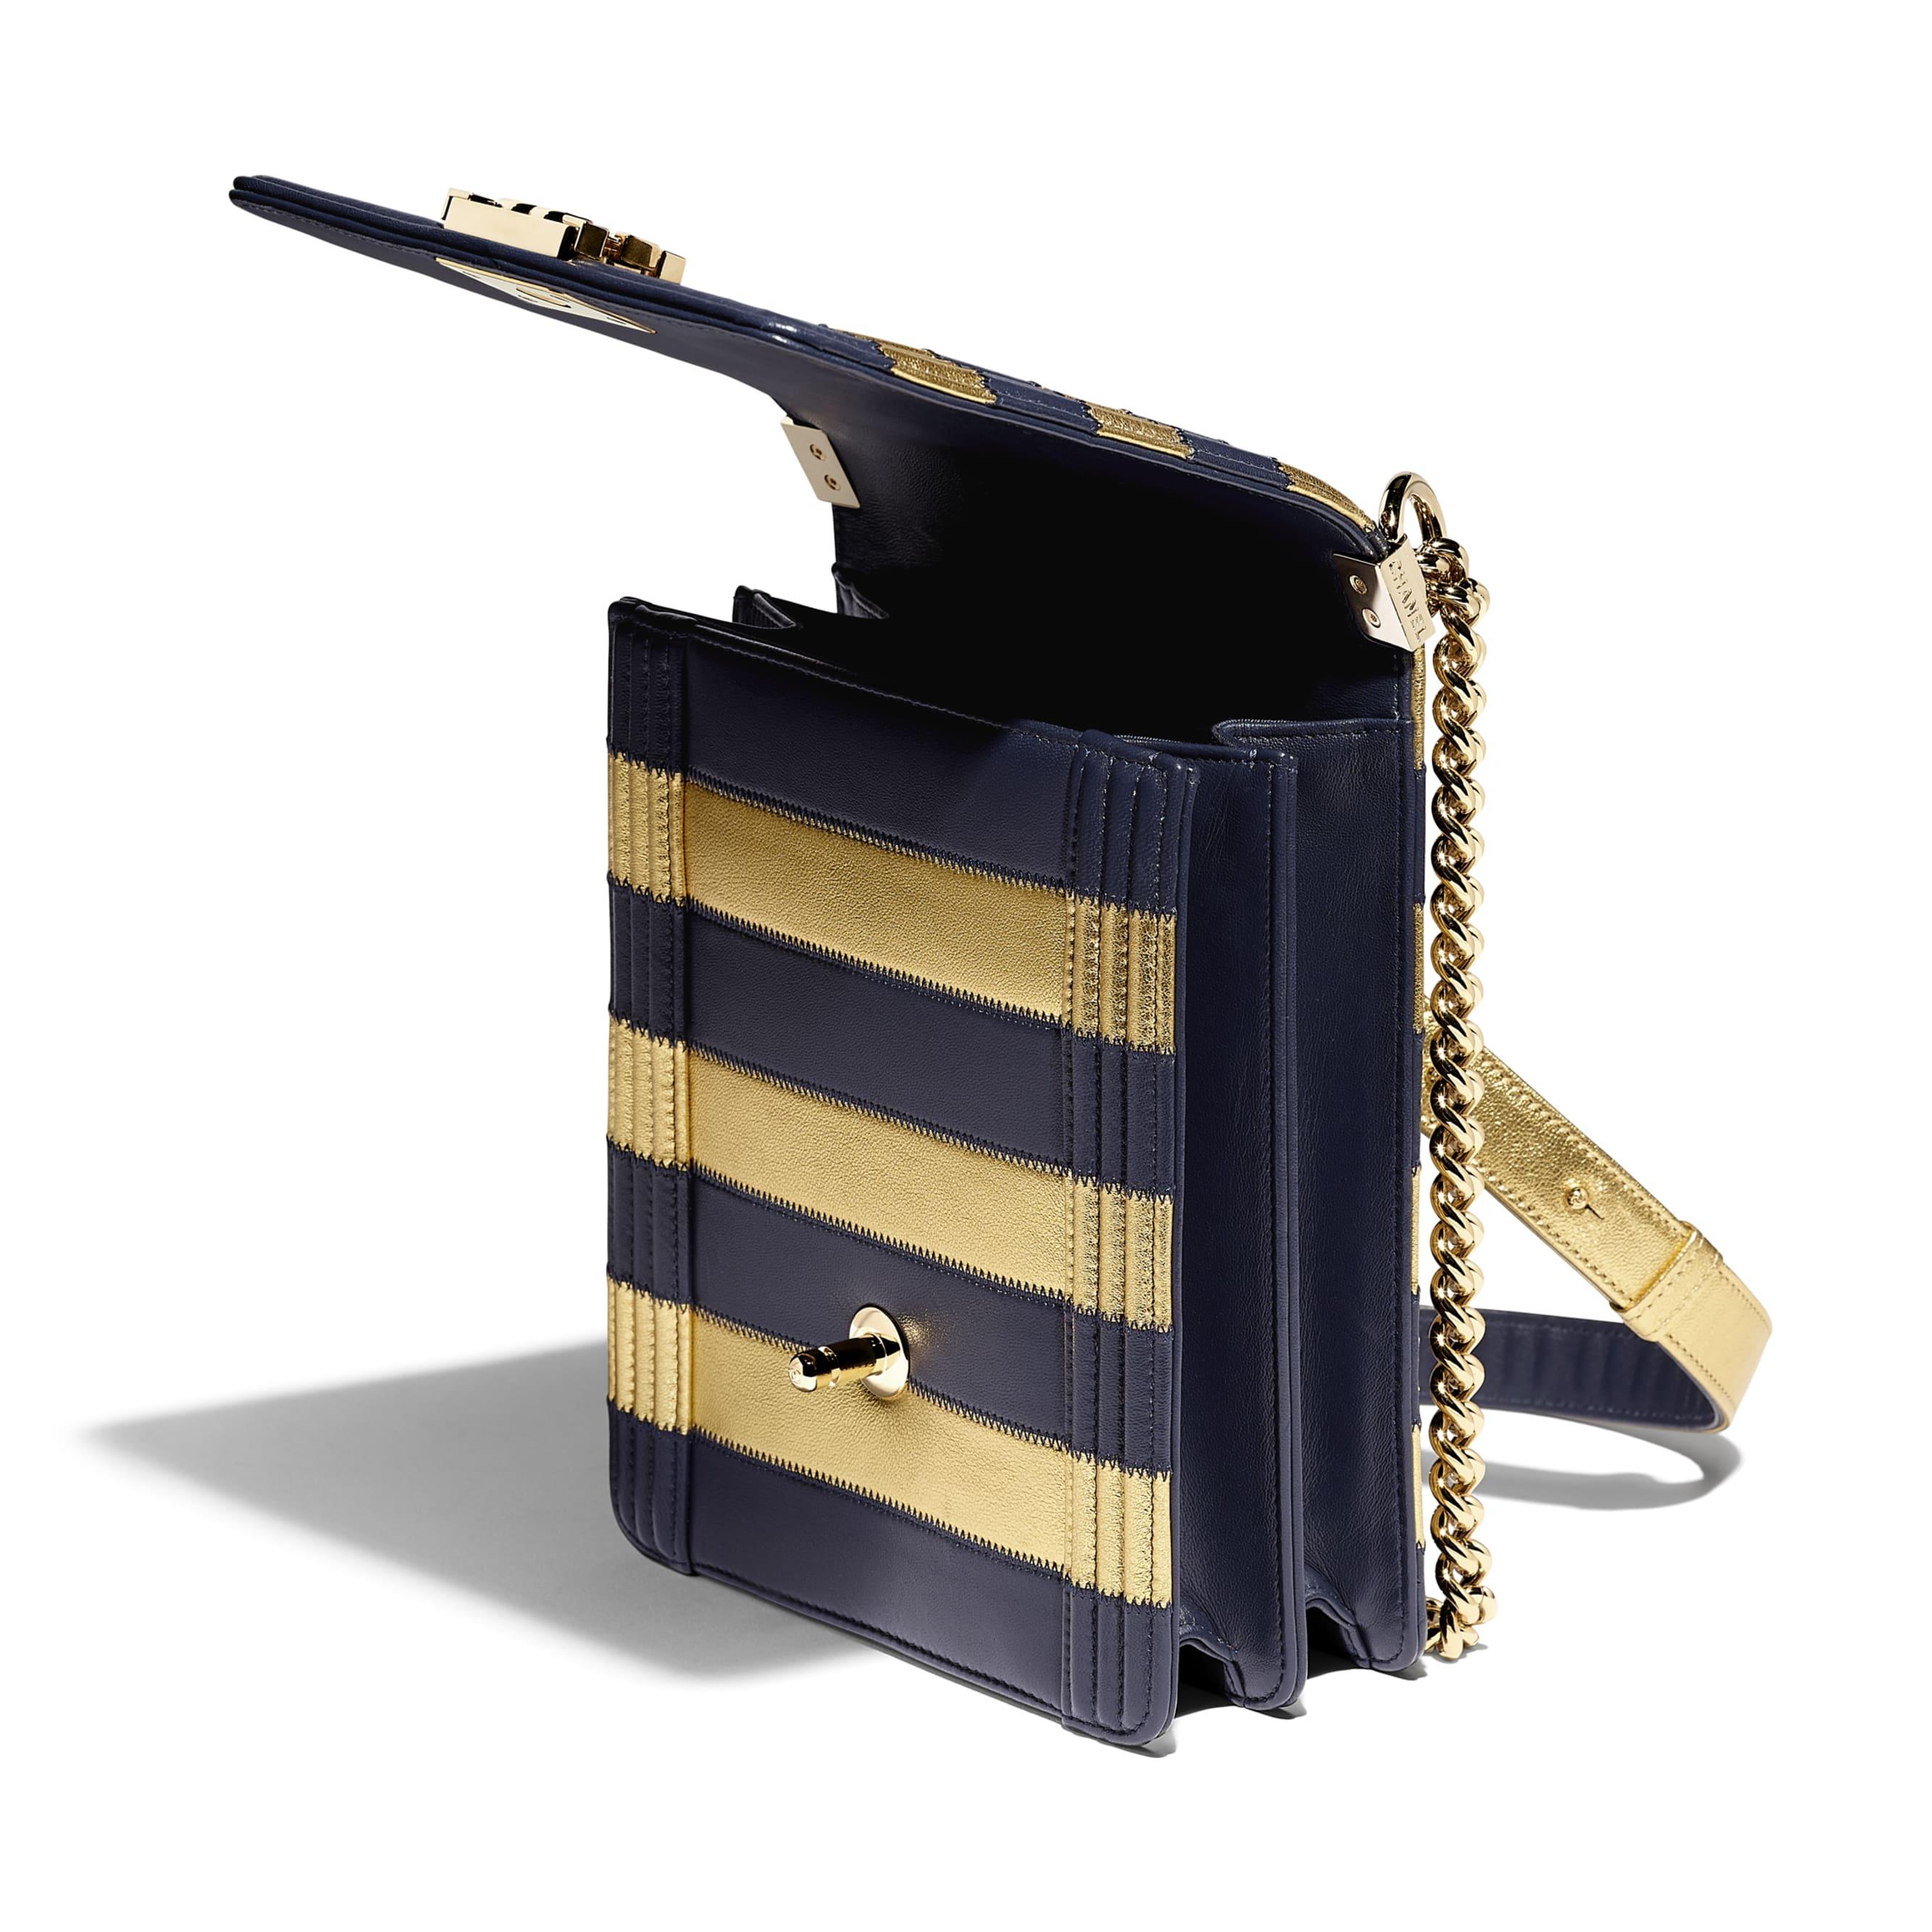 BOY CHANEL Handbag - Gold & Navy Blue - Lambskin, Calfskin & Gold-Tone Metal - Other view - see standard sized version